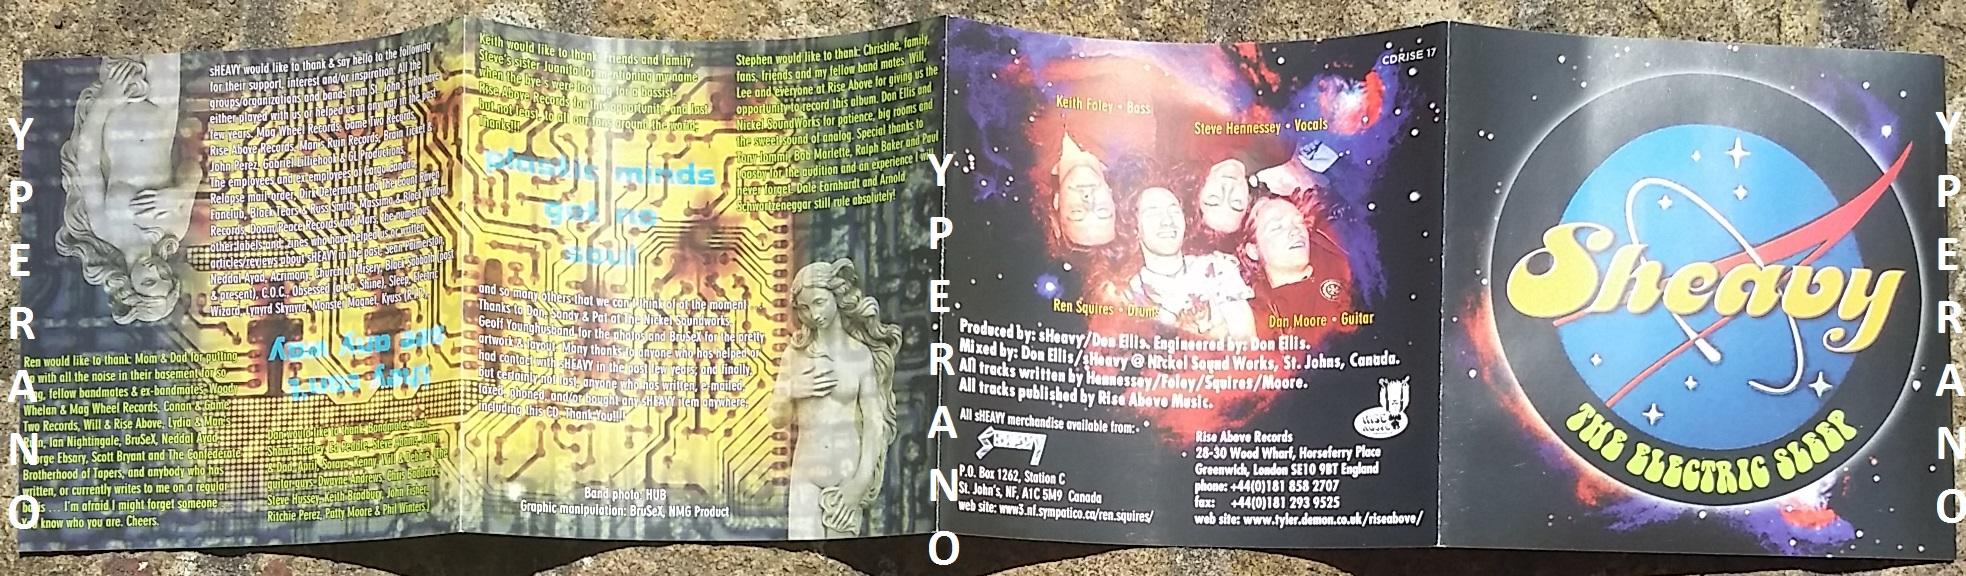 SHEAVY: The Electric Sleep PROMO CD  Original, 1st press 1998 RARE with 2  stickers  Stoner, Doom  Very Ozzy Osbourne like vocals! Check audio